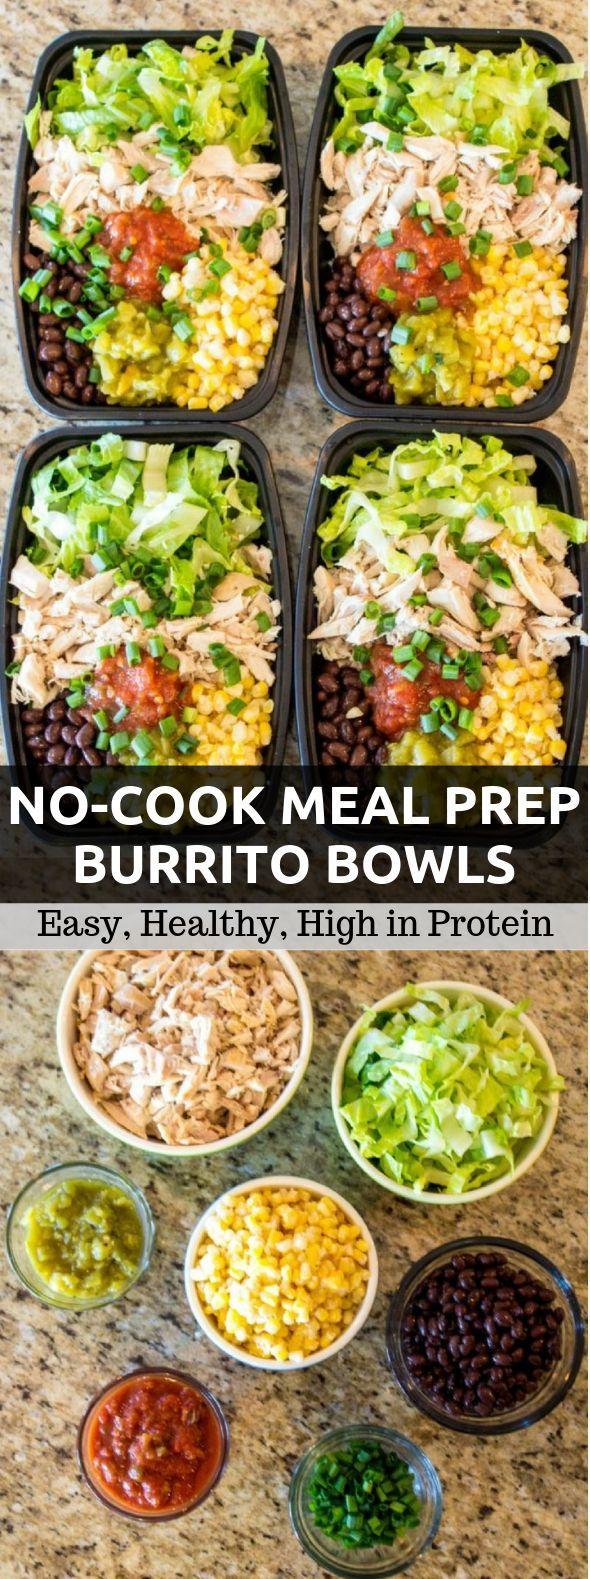 No-Cook Mahlzeit Prep Burrito Schalen #Lunch #Mealprep   – Abendessen